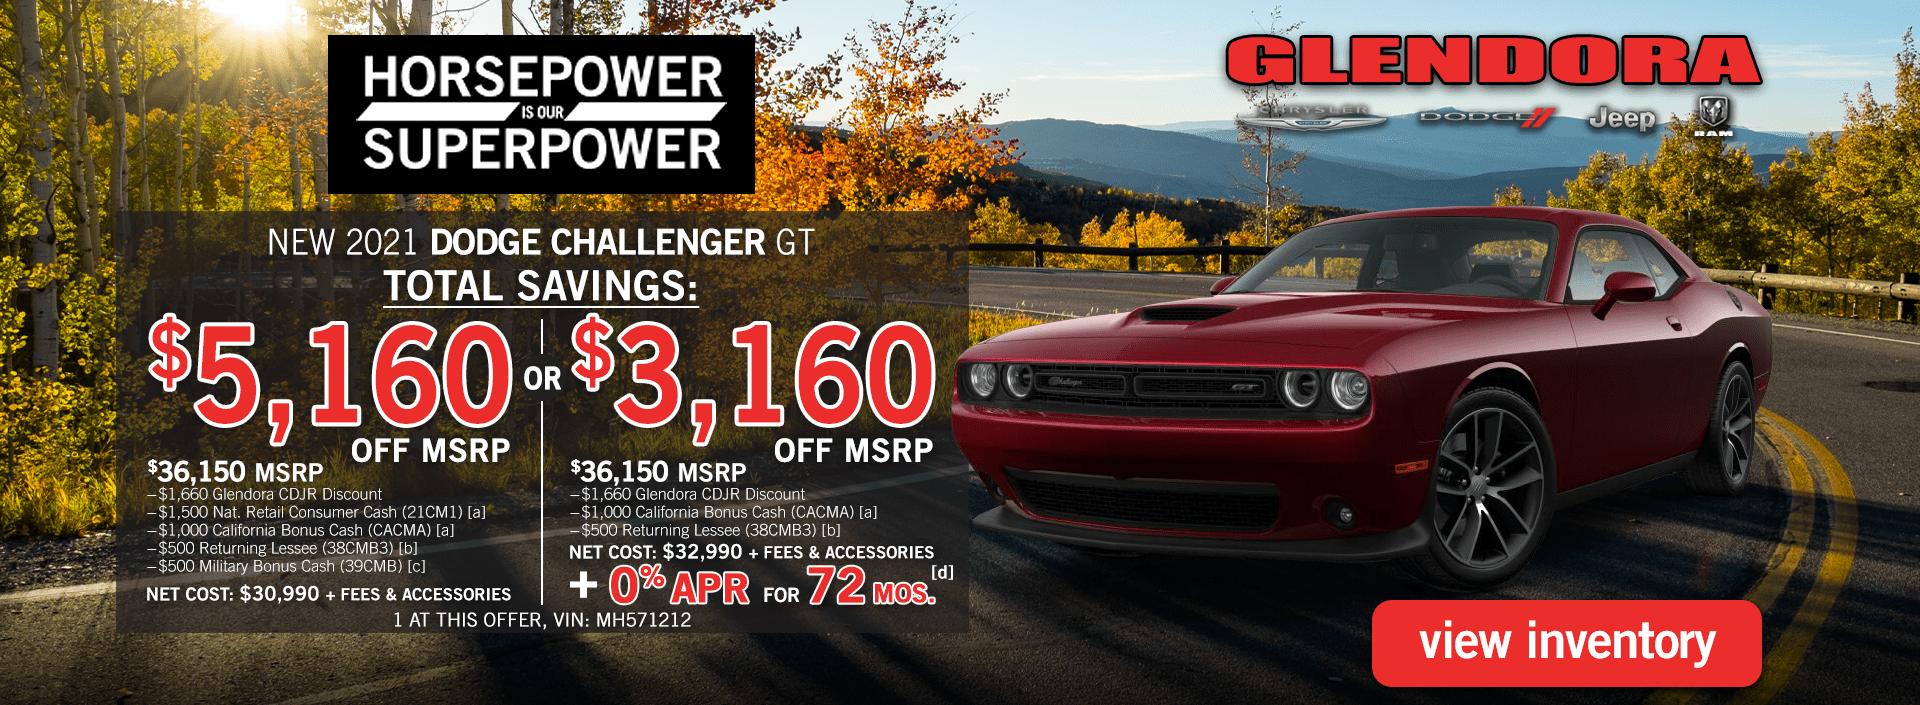 Glendora_CDJR_2021_October_Dodge_Challenger